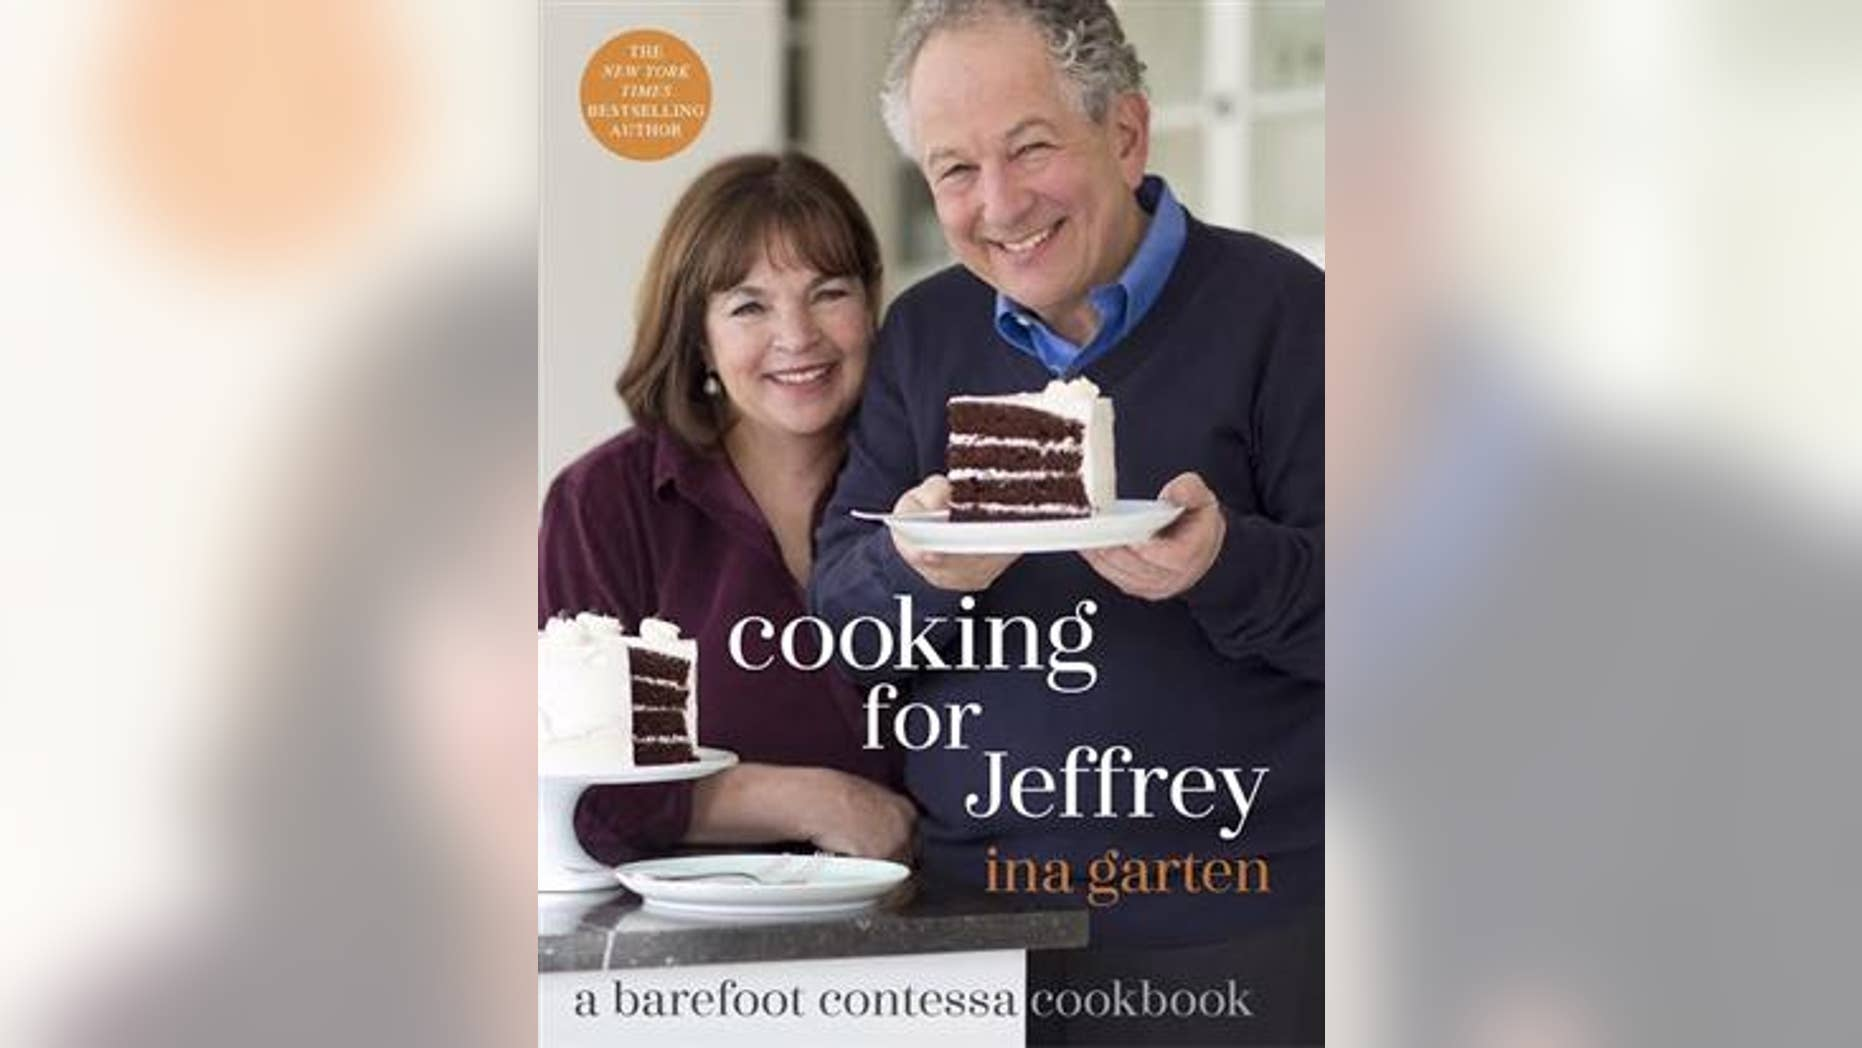 Ina Garten is sharing her husband's favorite recipes.